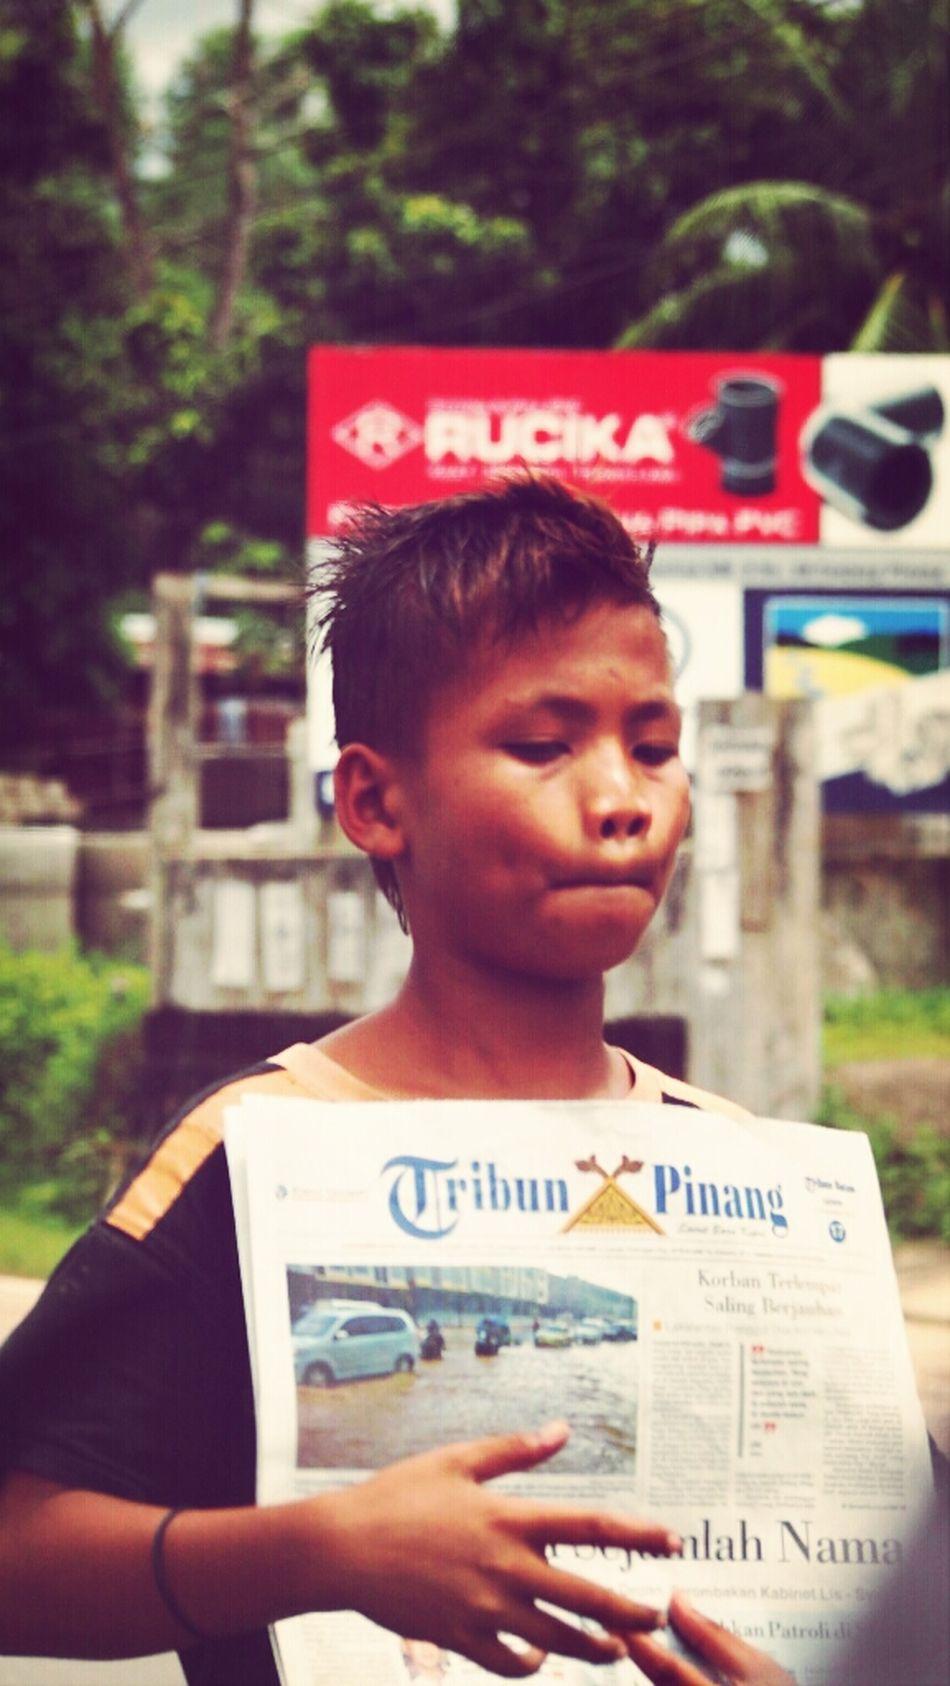 Tj.pinang Newspapers